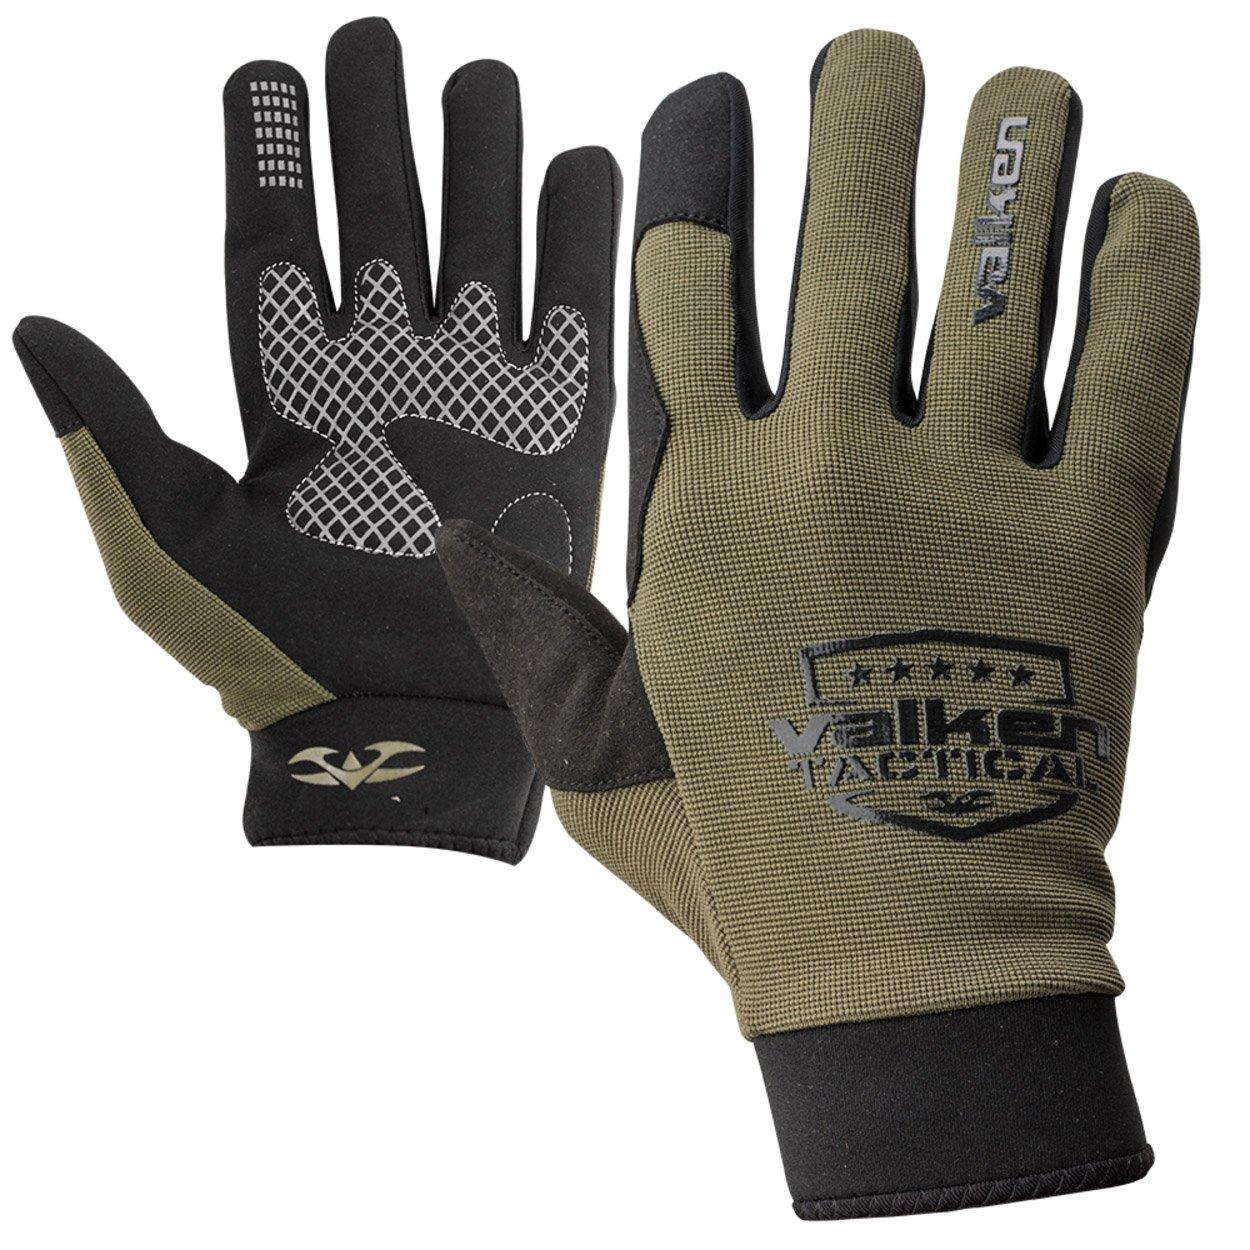 Valken Tactical Sierra II Gloves withシリコングリップとタッチスクリーン機能 オリーブ Medium Mediumオリーブ B00MJ8MKZO